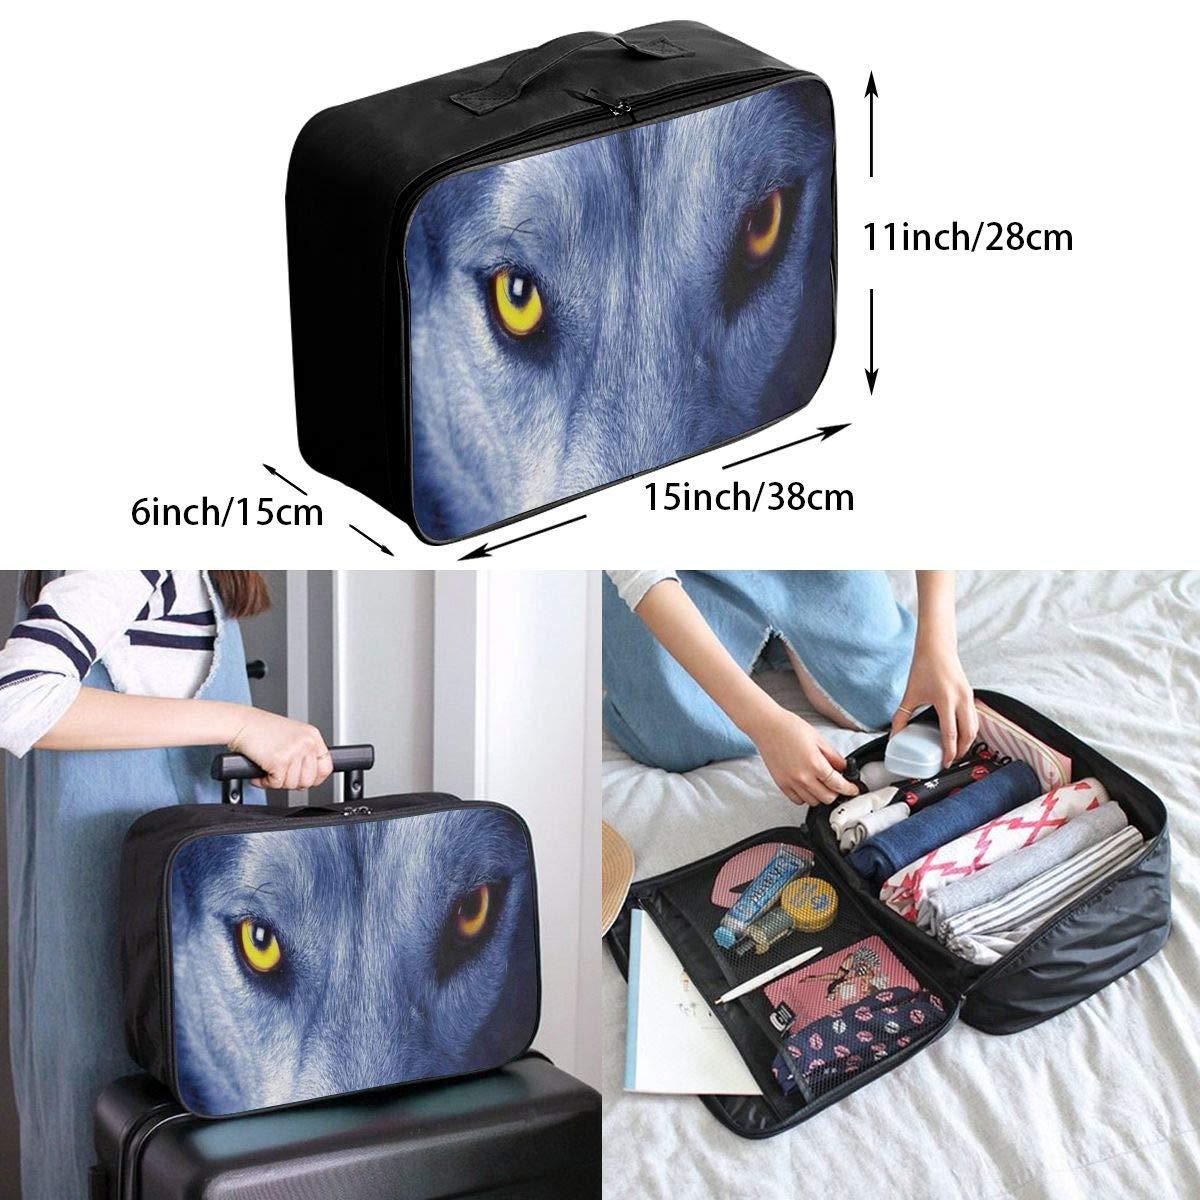 Travel Bags Wild Animal Tiger Portable Duffel Trolley Handle Luggage Bag